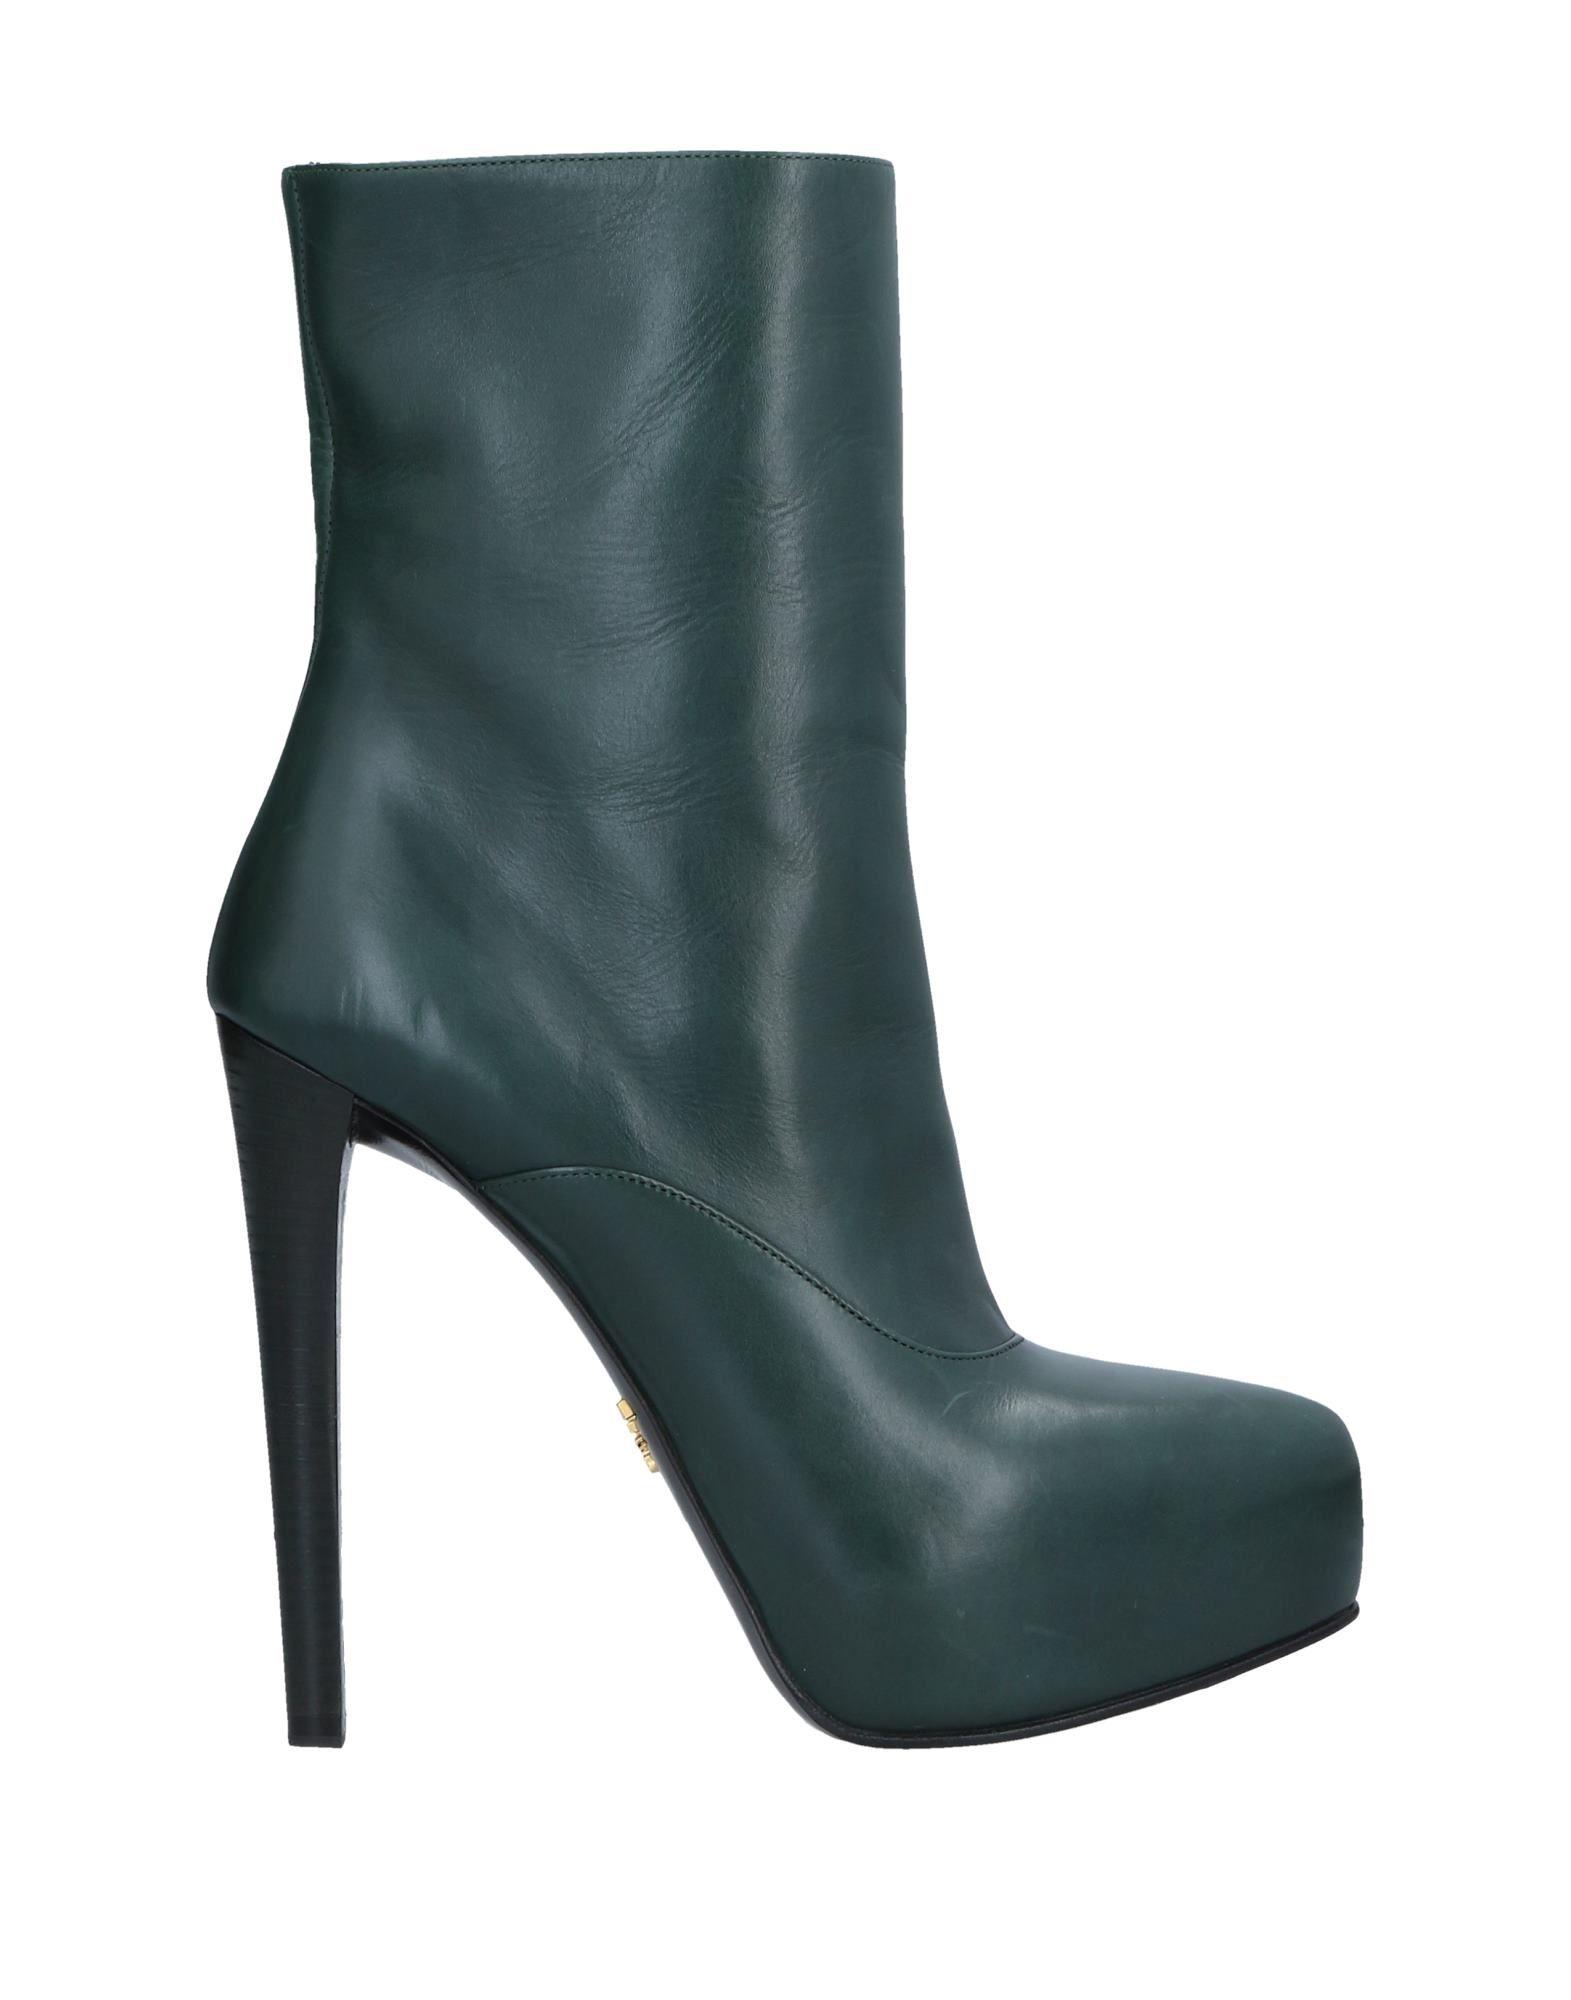 Prada Ankle Boot - Women Prada Ankle Boots online on 11530268XM  United Kingdom - 11530268XM on fa322c